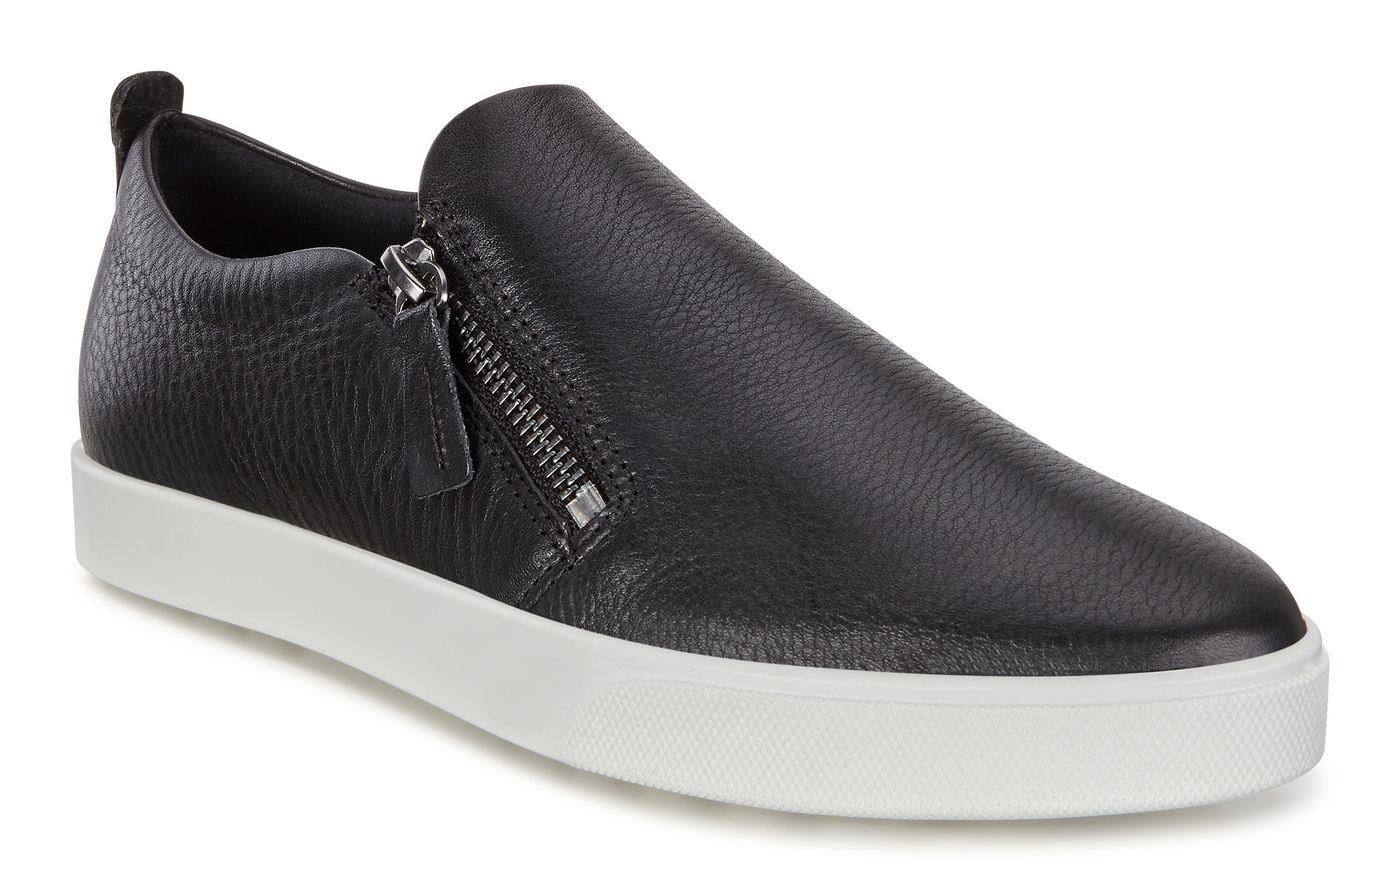 808de8d1 ECCO Gillian Shoe | Women's Slip On Sneakers | ECCO® Shoes in 2019 ...